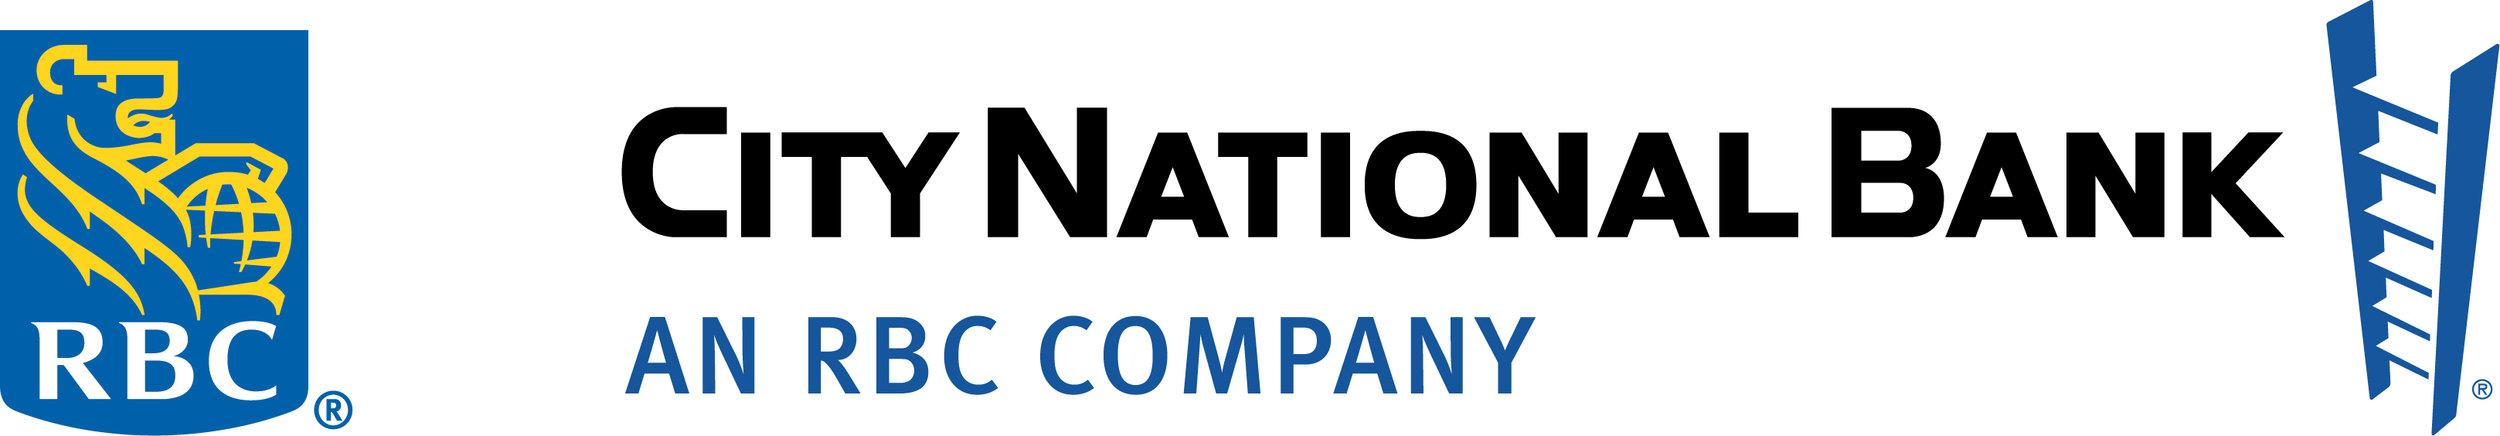 CNB-RBC Integrated Logo_Co-Brand.jpg